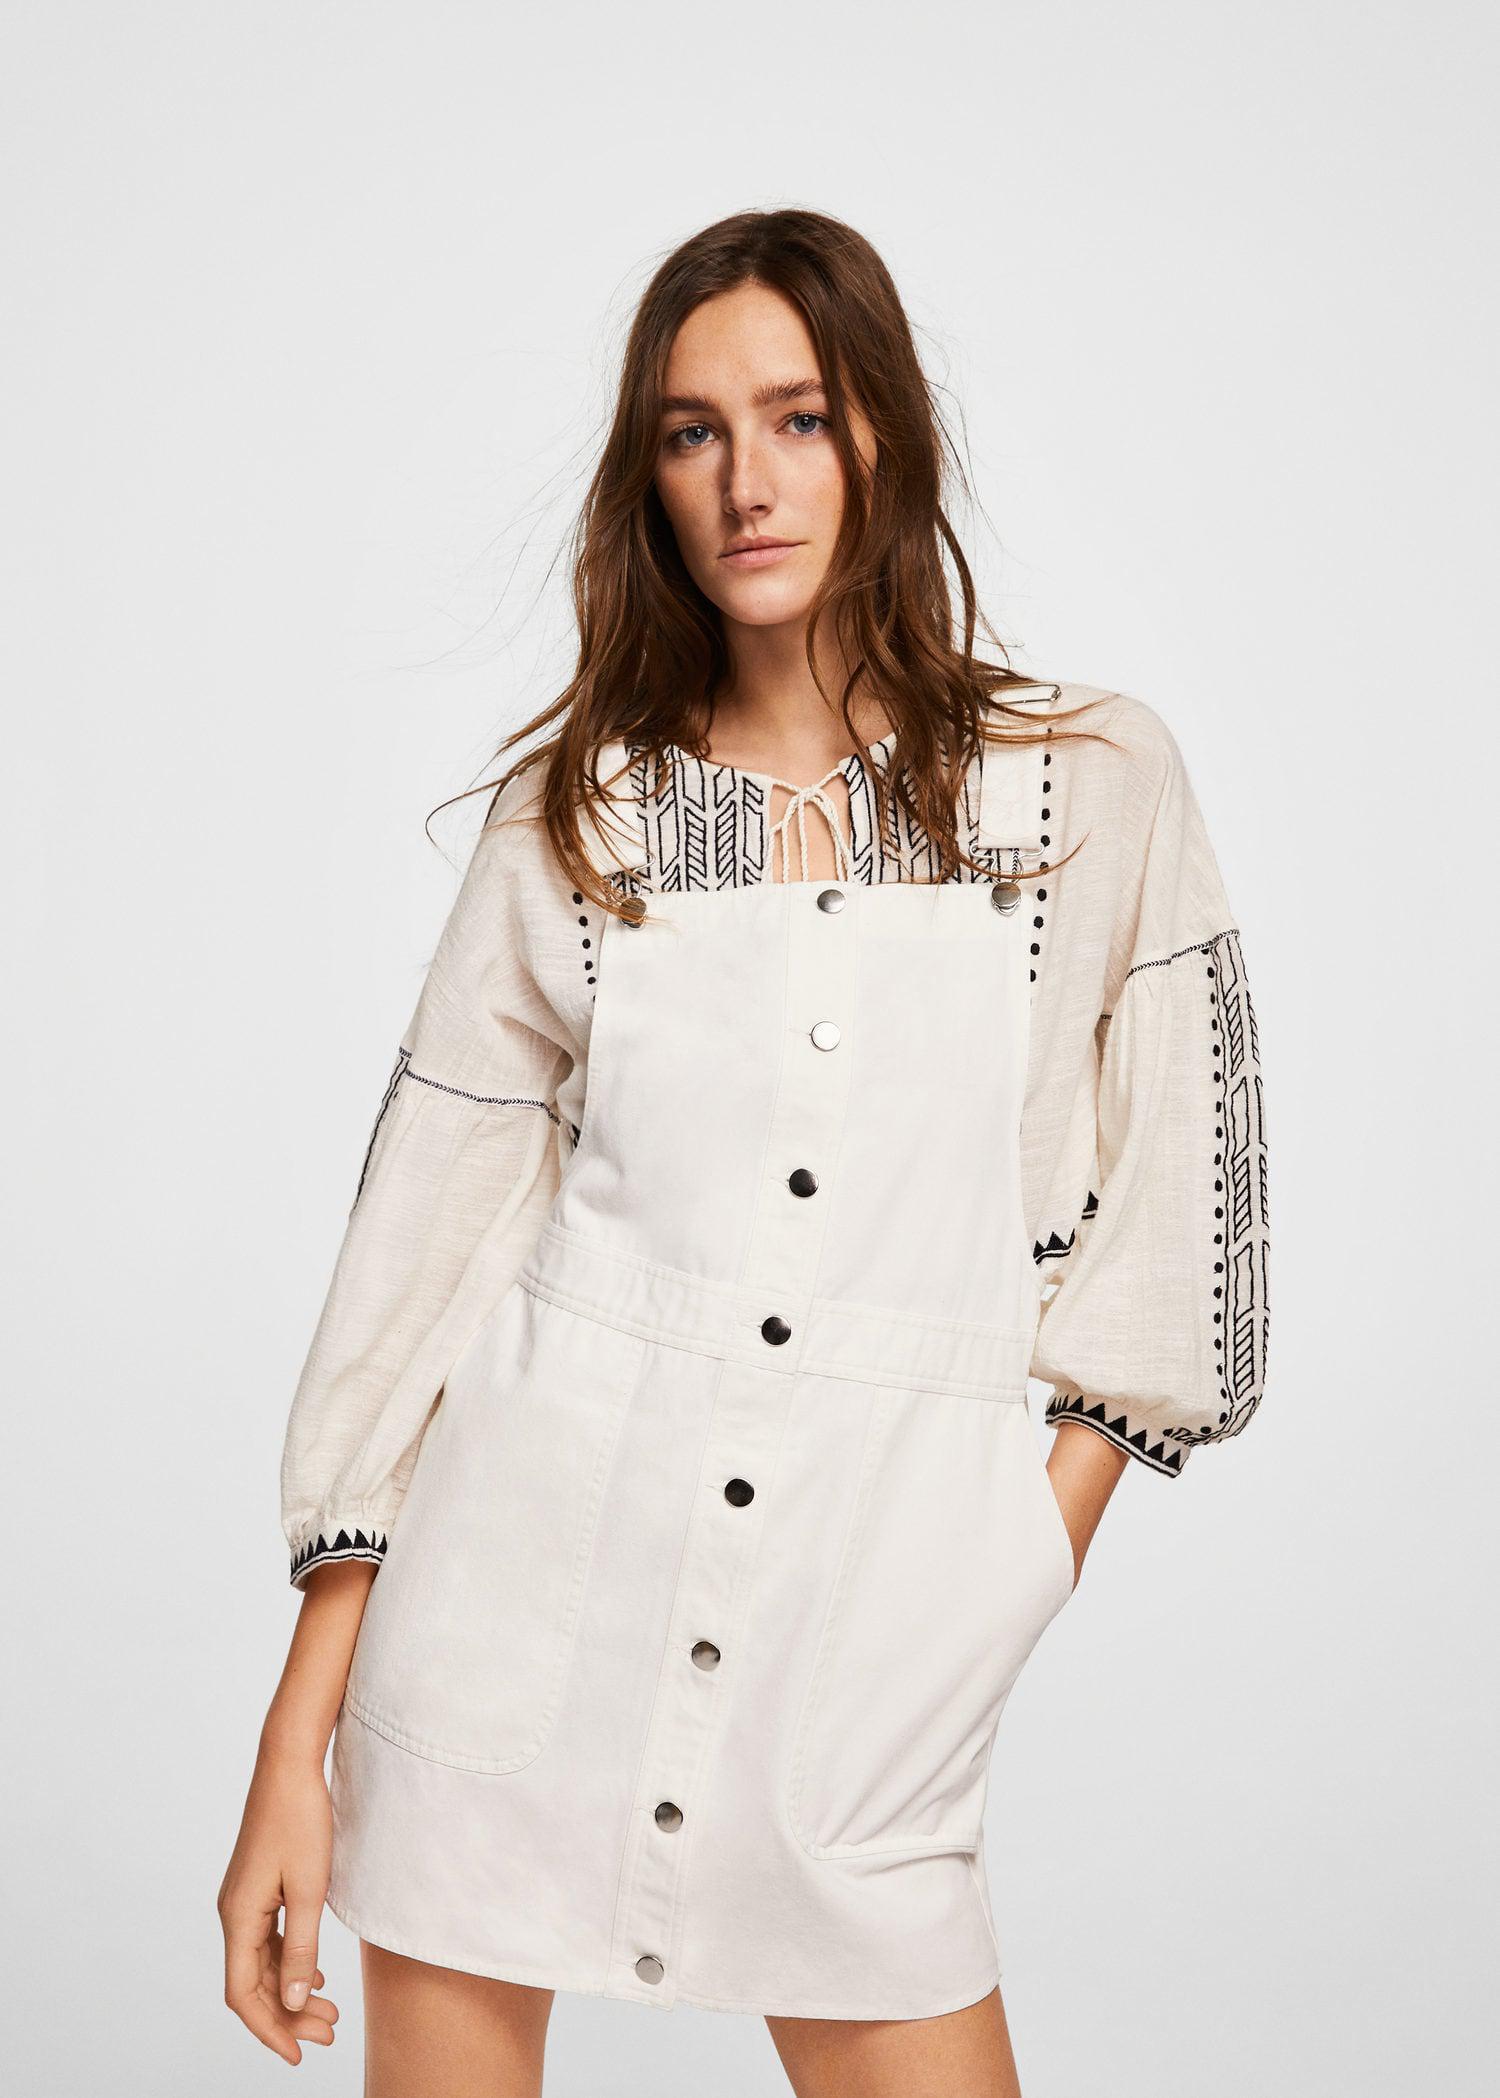 a09de0e6398 Mango Short Cotton Pinafore Dress in White - Lyst